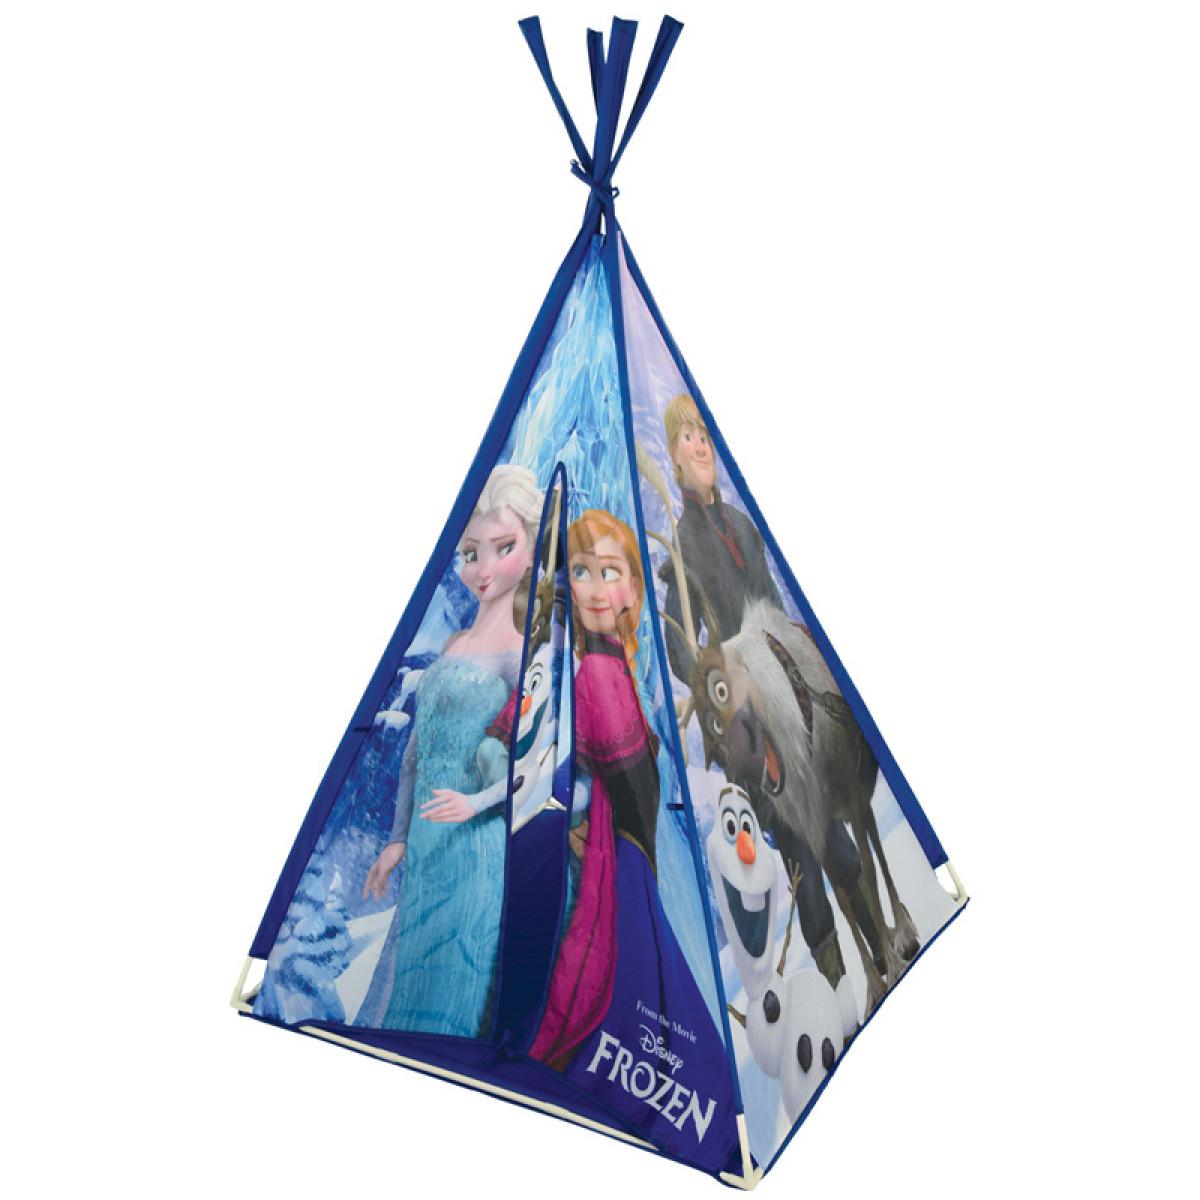 Disney Frozen Teepee Play Tent